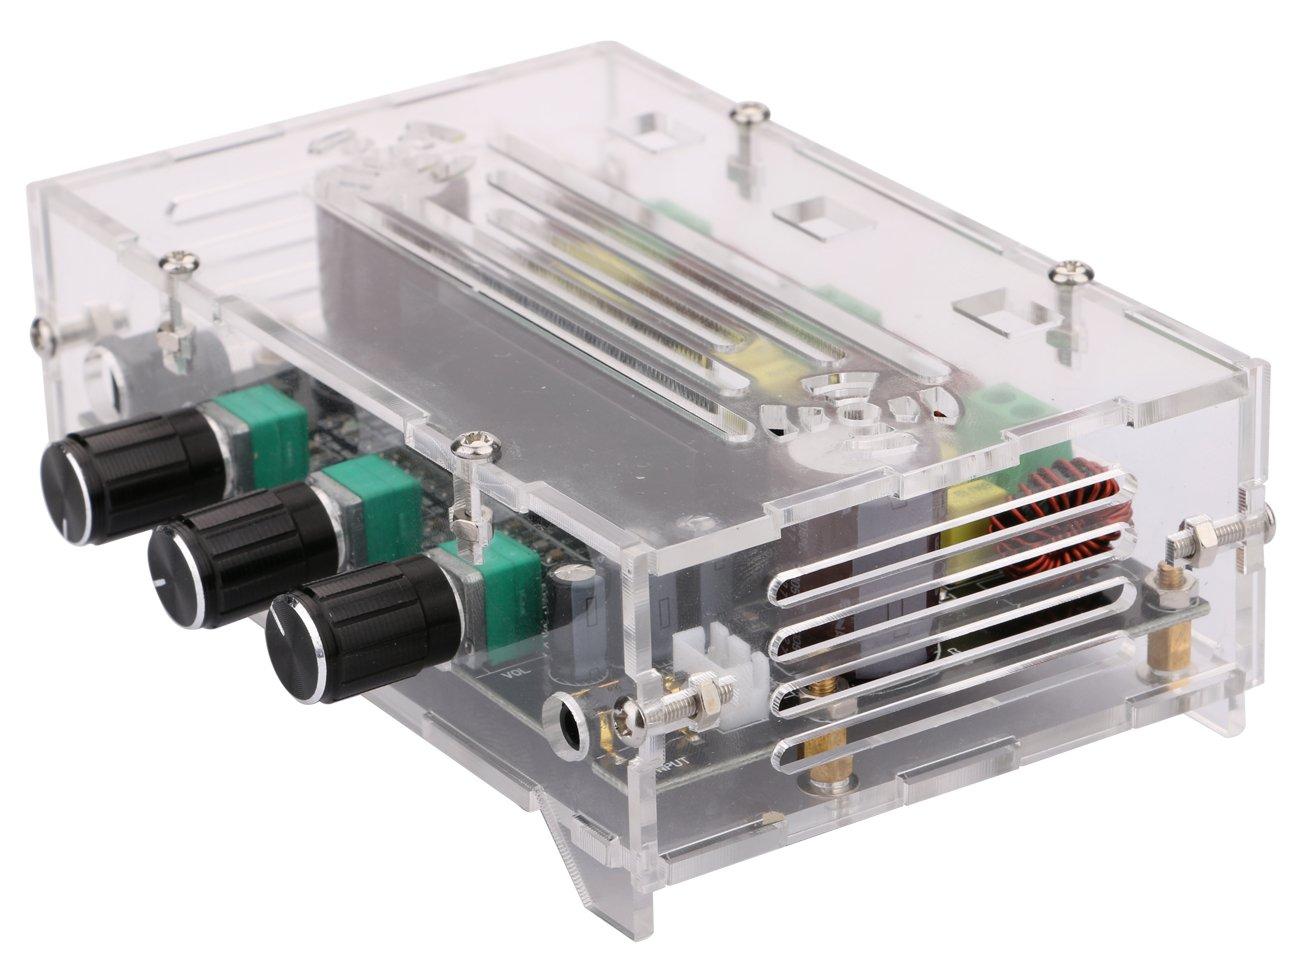 80w 80w 100w Digital Power Amplifier Board With Acrylic Case Yeeco